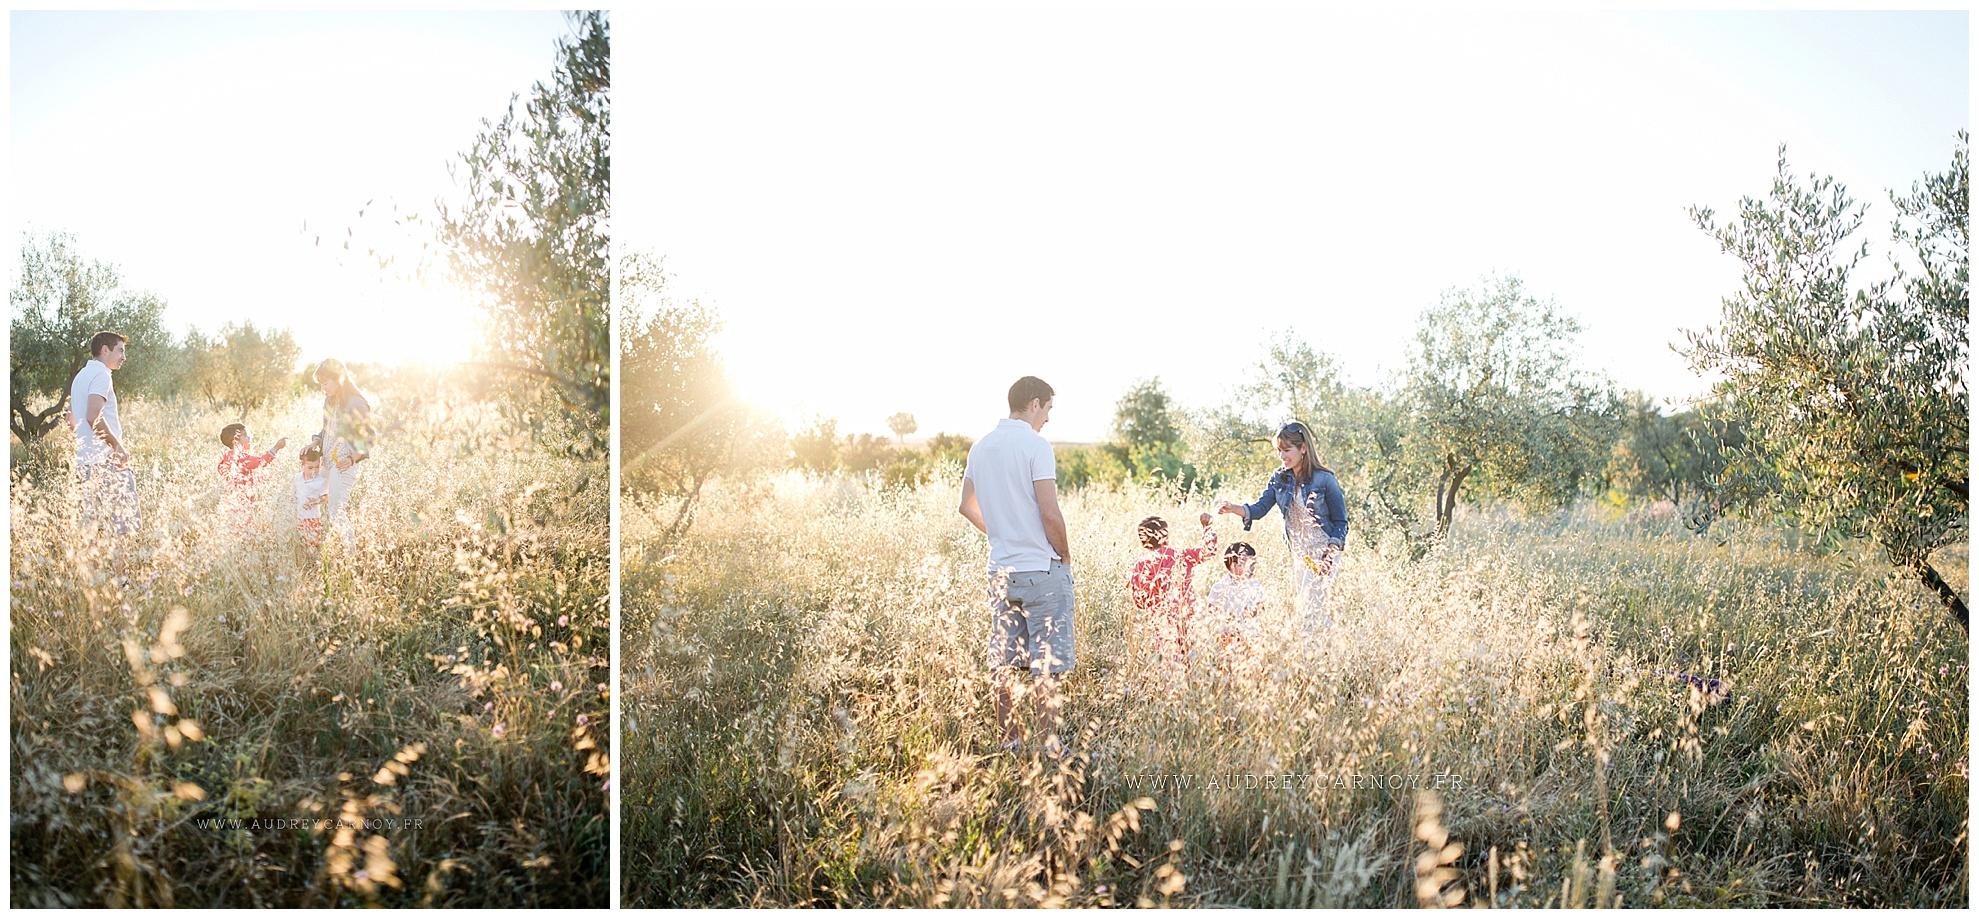 Séance famille - Valensole | Nathalie 8